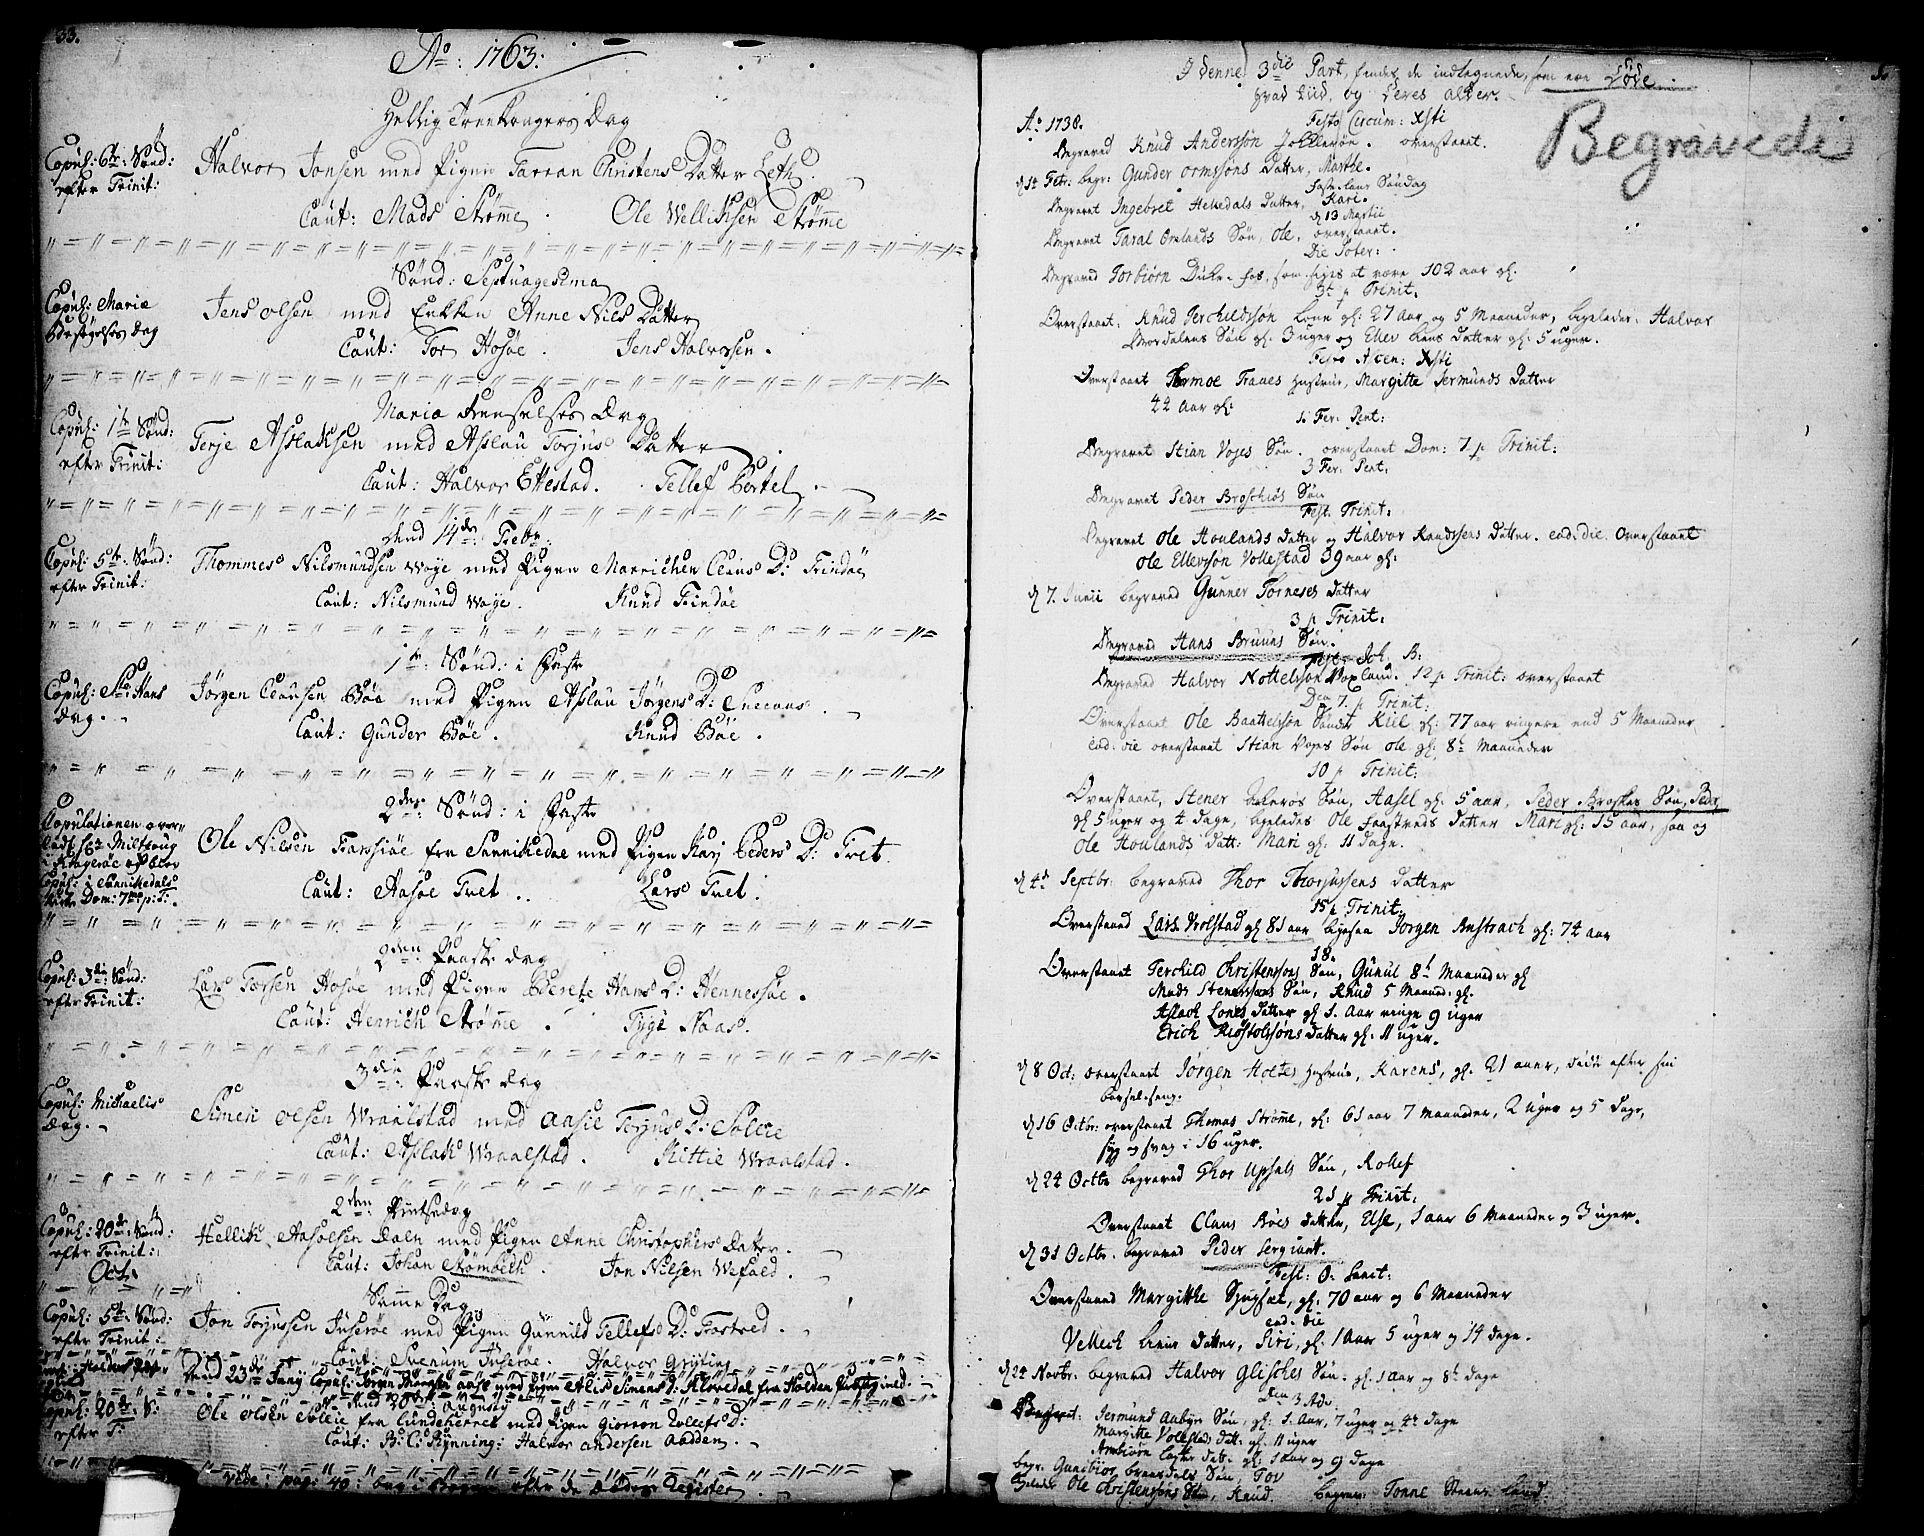 SAKO, Drangedal kirkebøker, F/Fa/L0001: Ministerialbok nr. 1, 1697-1767, s. 33-34